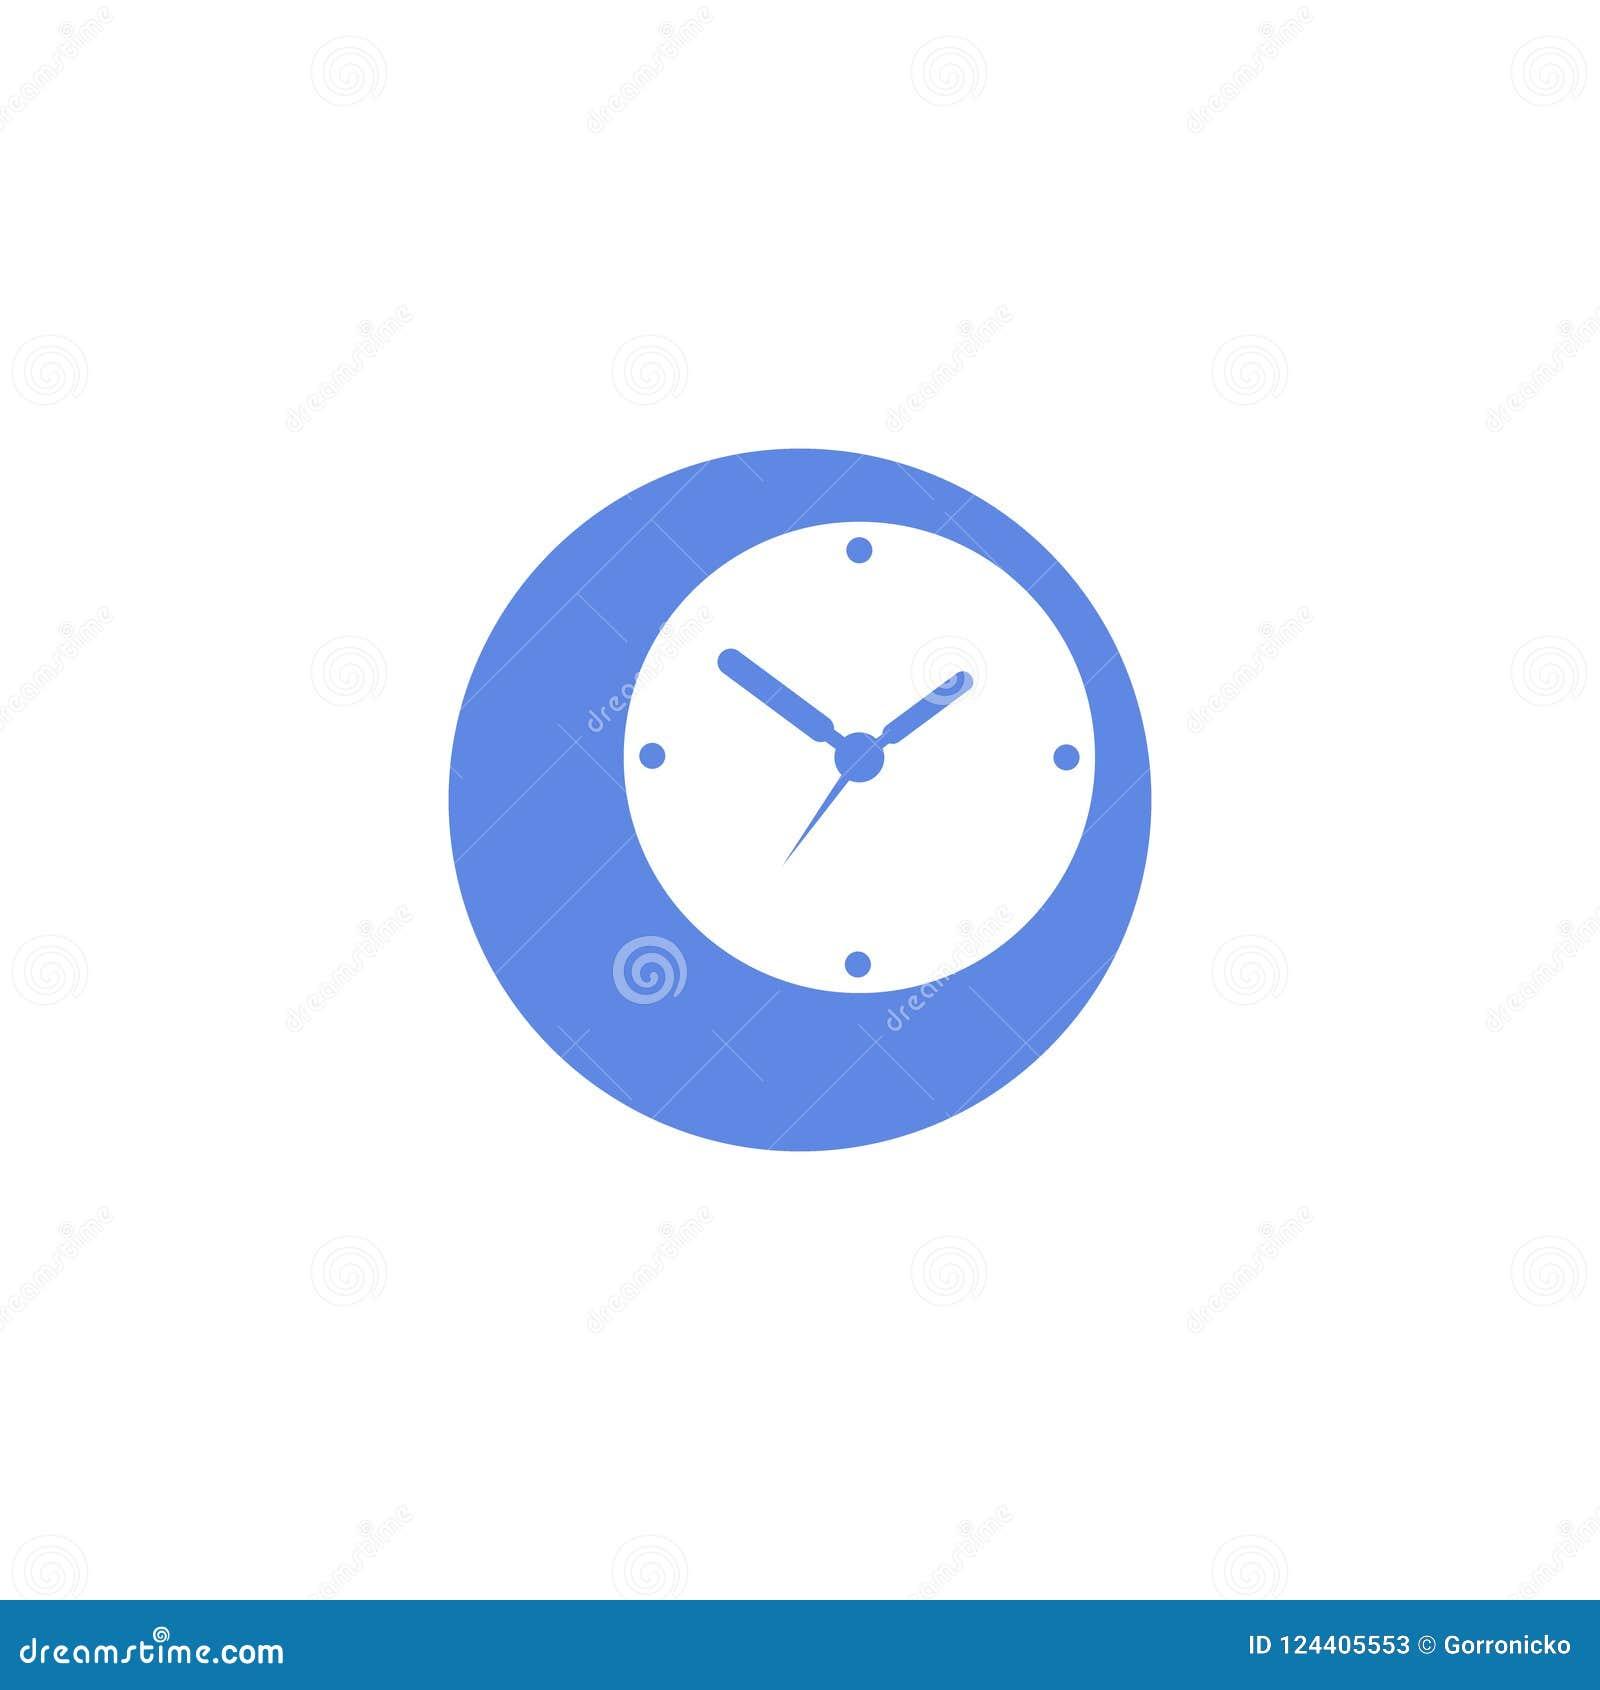 Simple Vector Flat Art Round Icon Of Analog Clock Stock